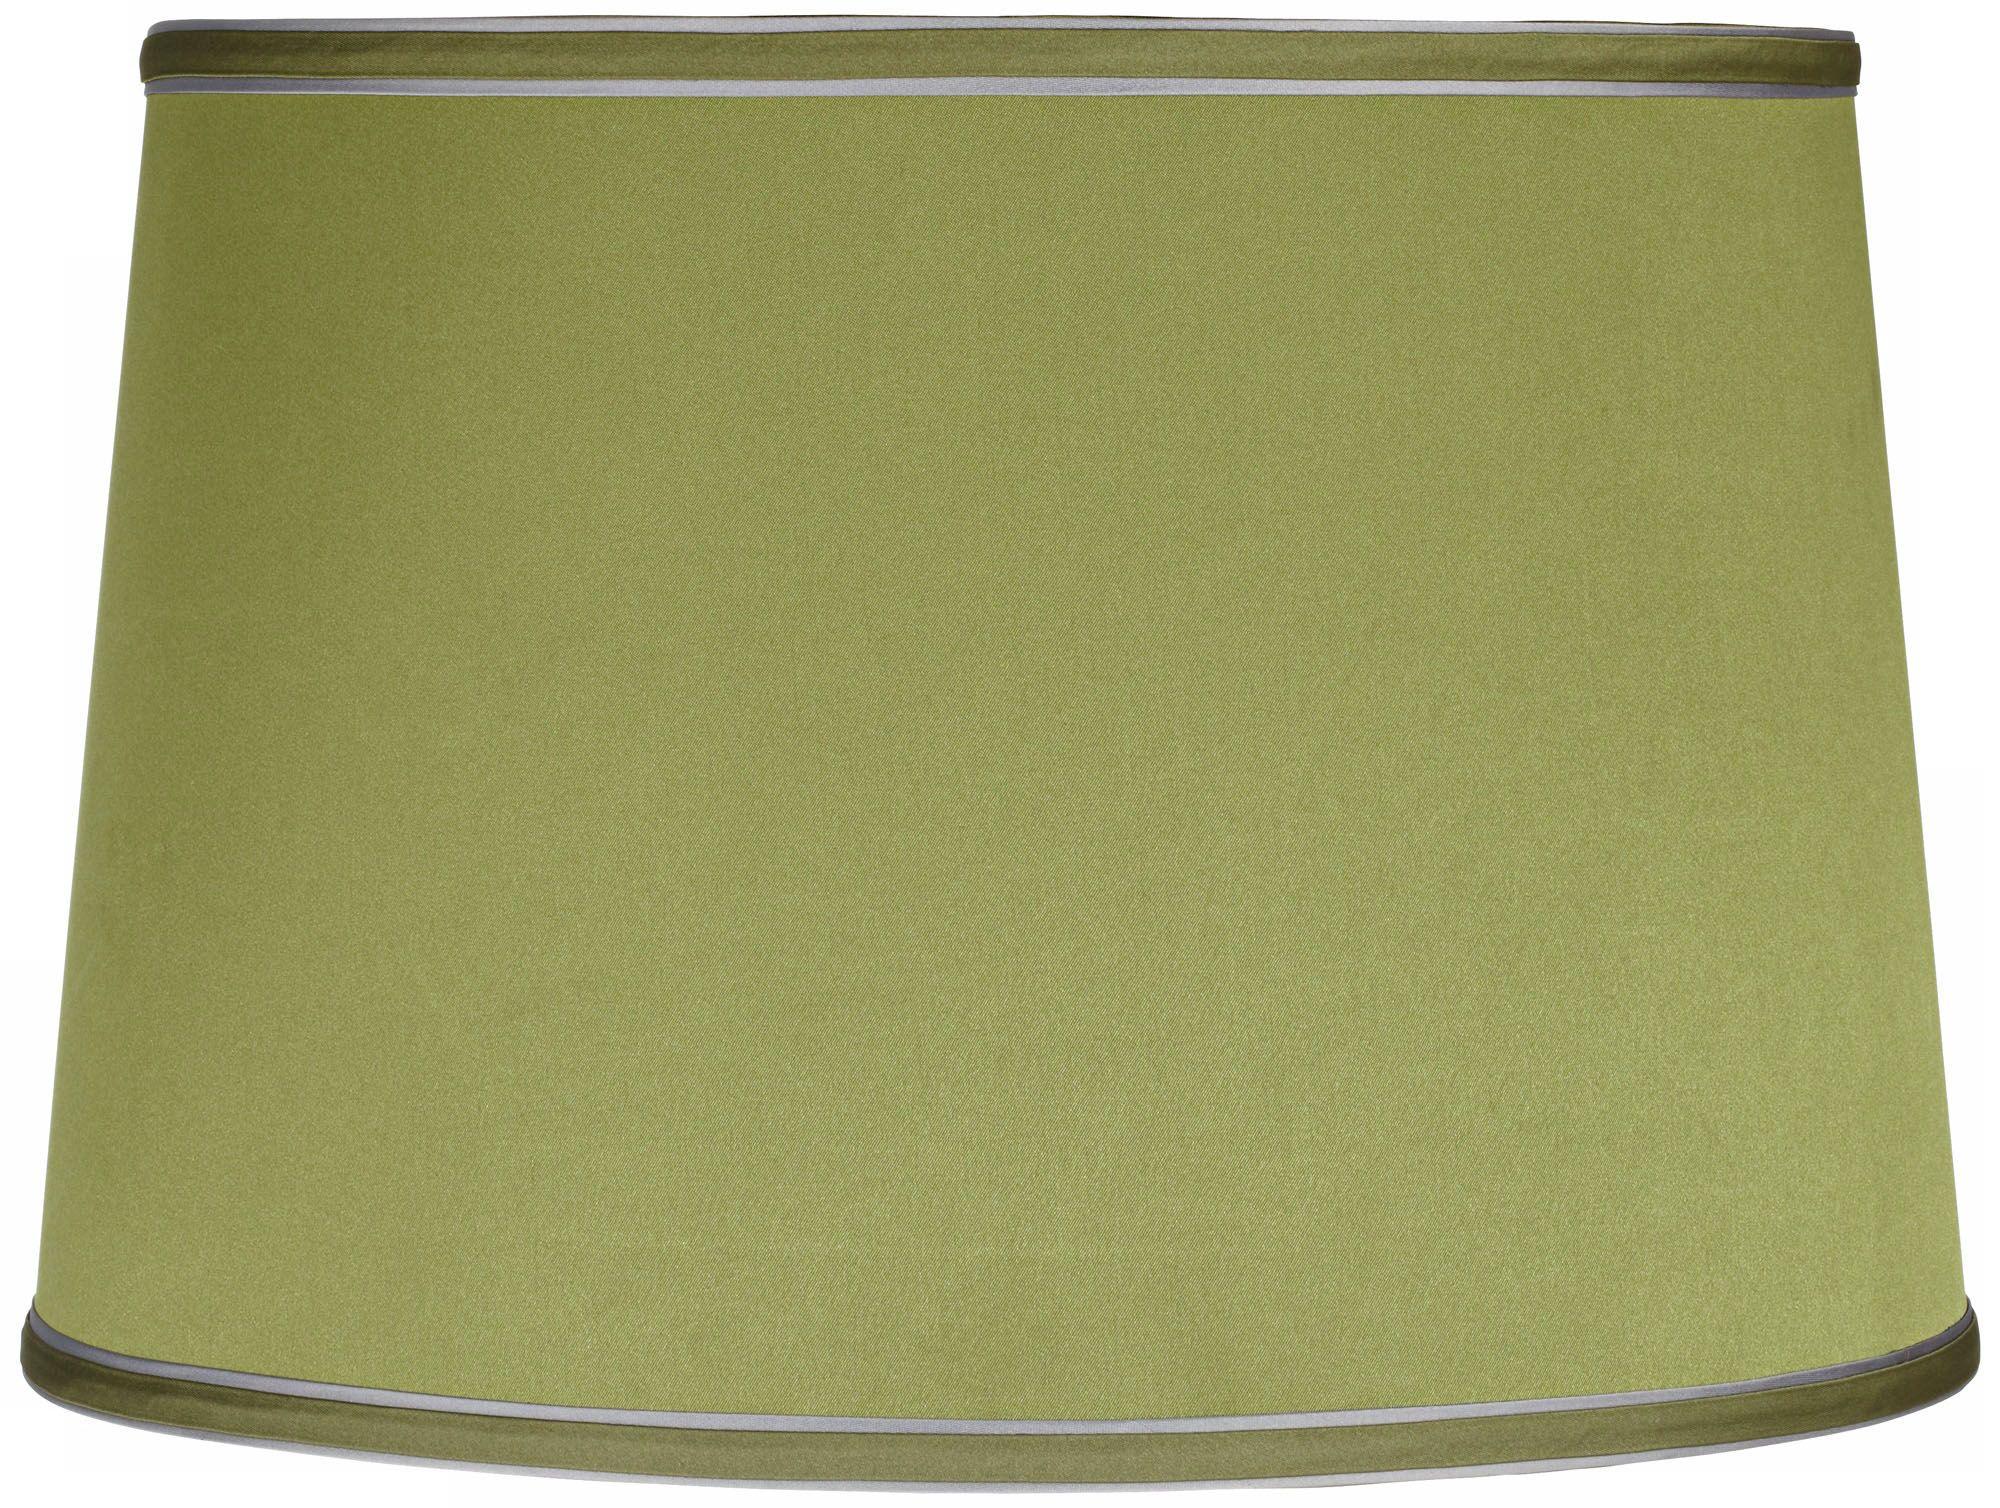 sydnee satin olive green drum lamp shade 14x16x11 spider